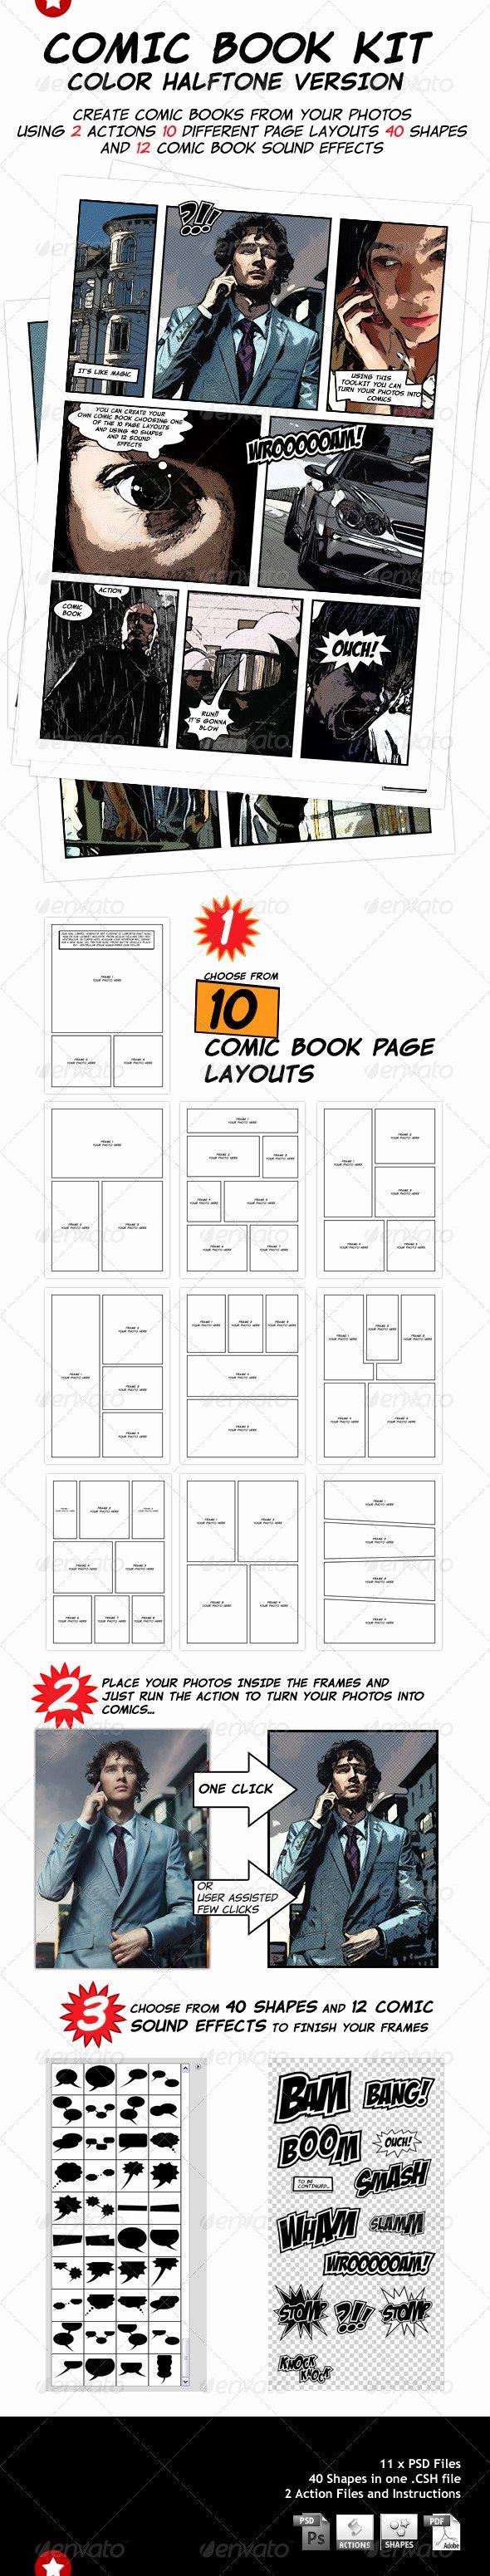 Comic Book Template Photoshop Fresh 300 Shop Effects Templates Best Designers